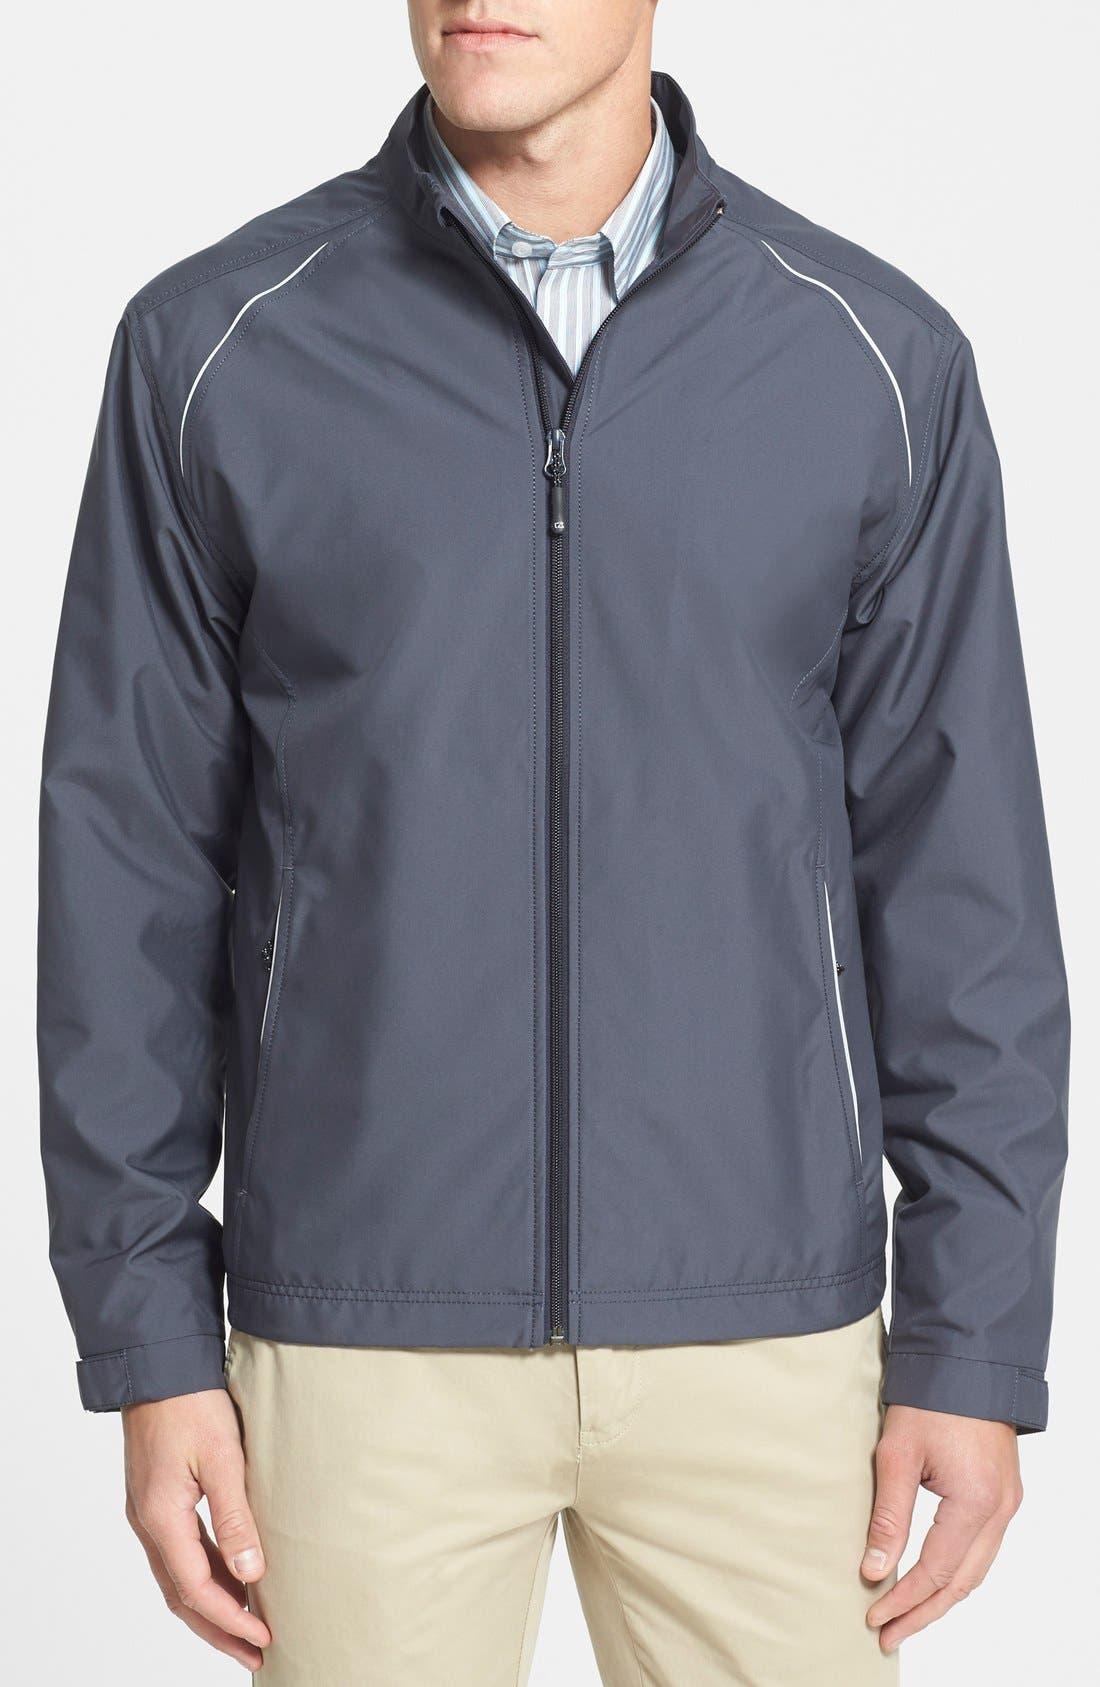 Cutter & Buck 'WeatherTec Beacon' Water Resistant Jacket (Big & Tall)